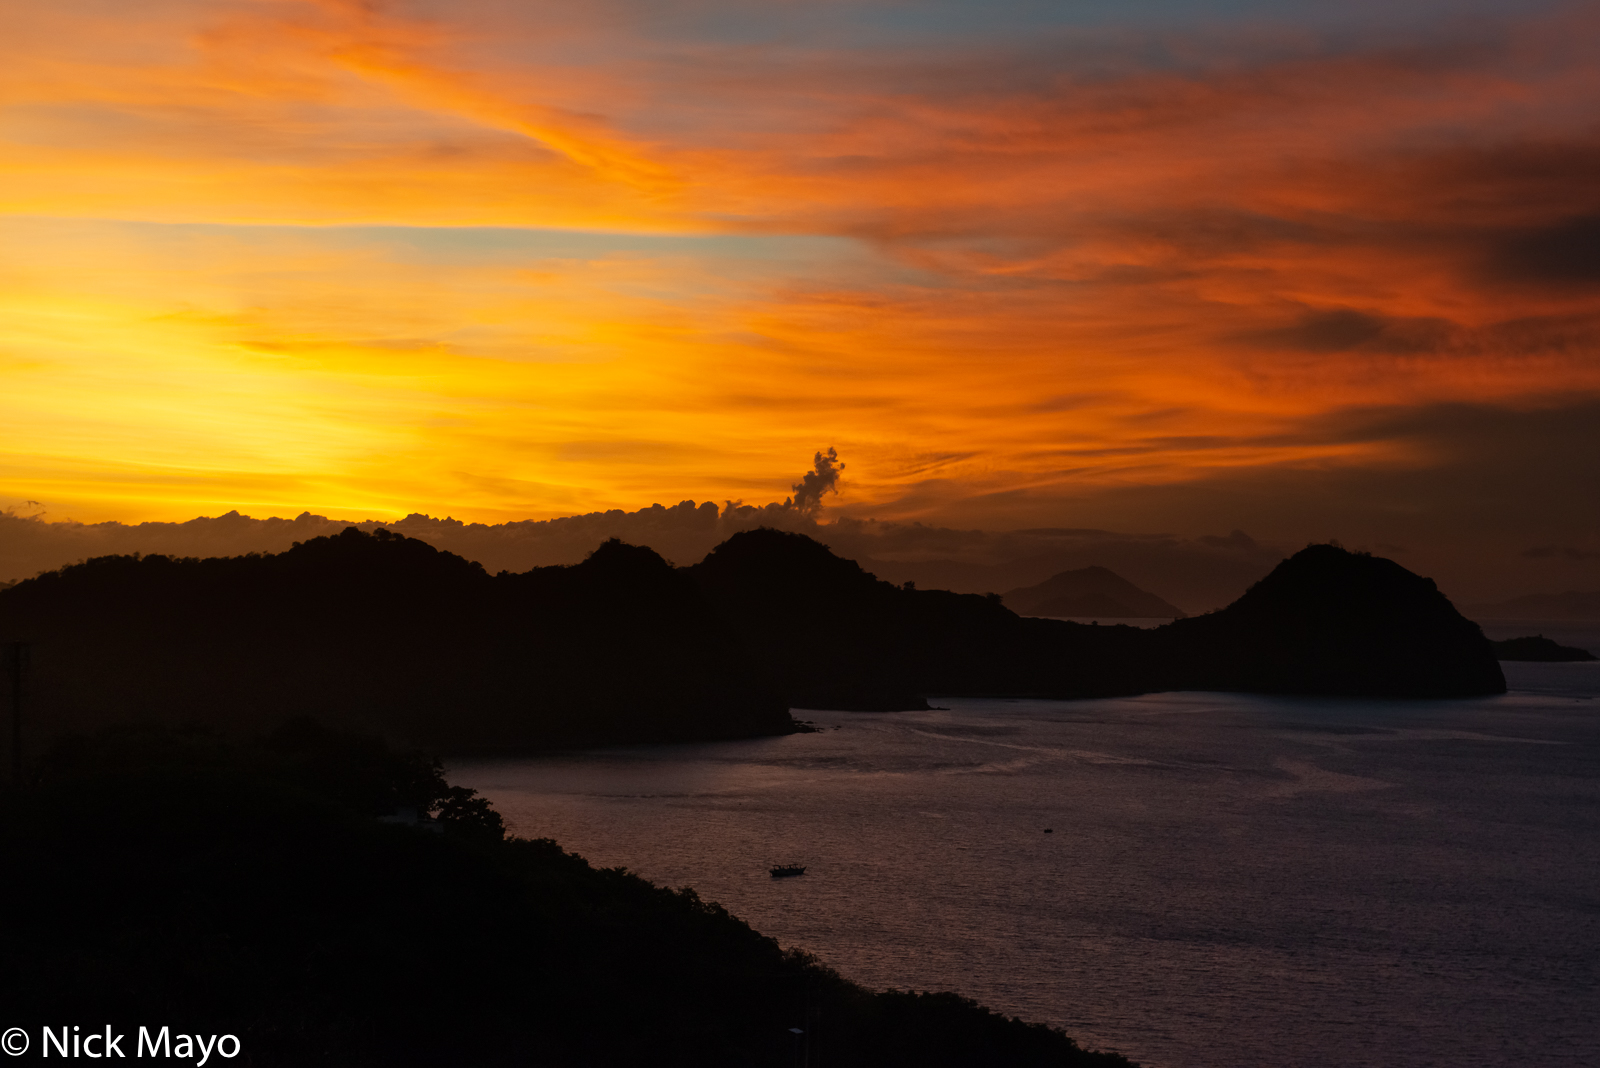 Sunset over the coastline of Labuan Bajo in West Manggarai Regency.